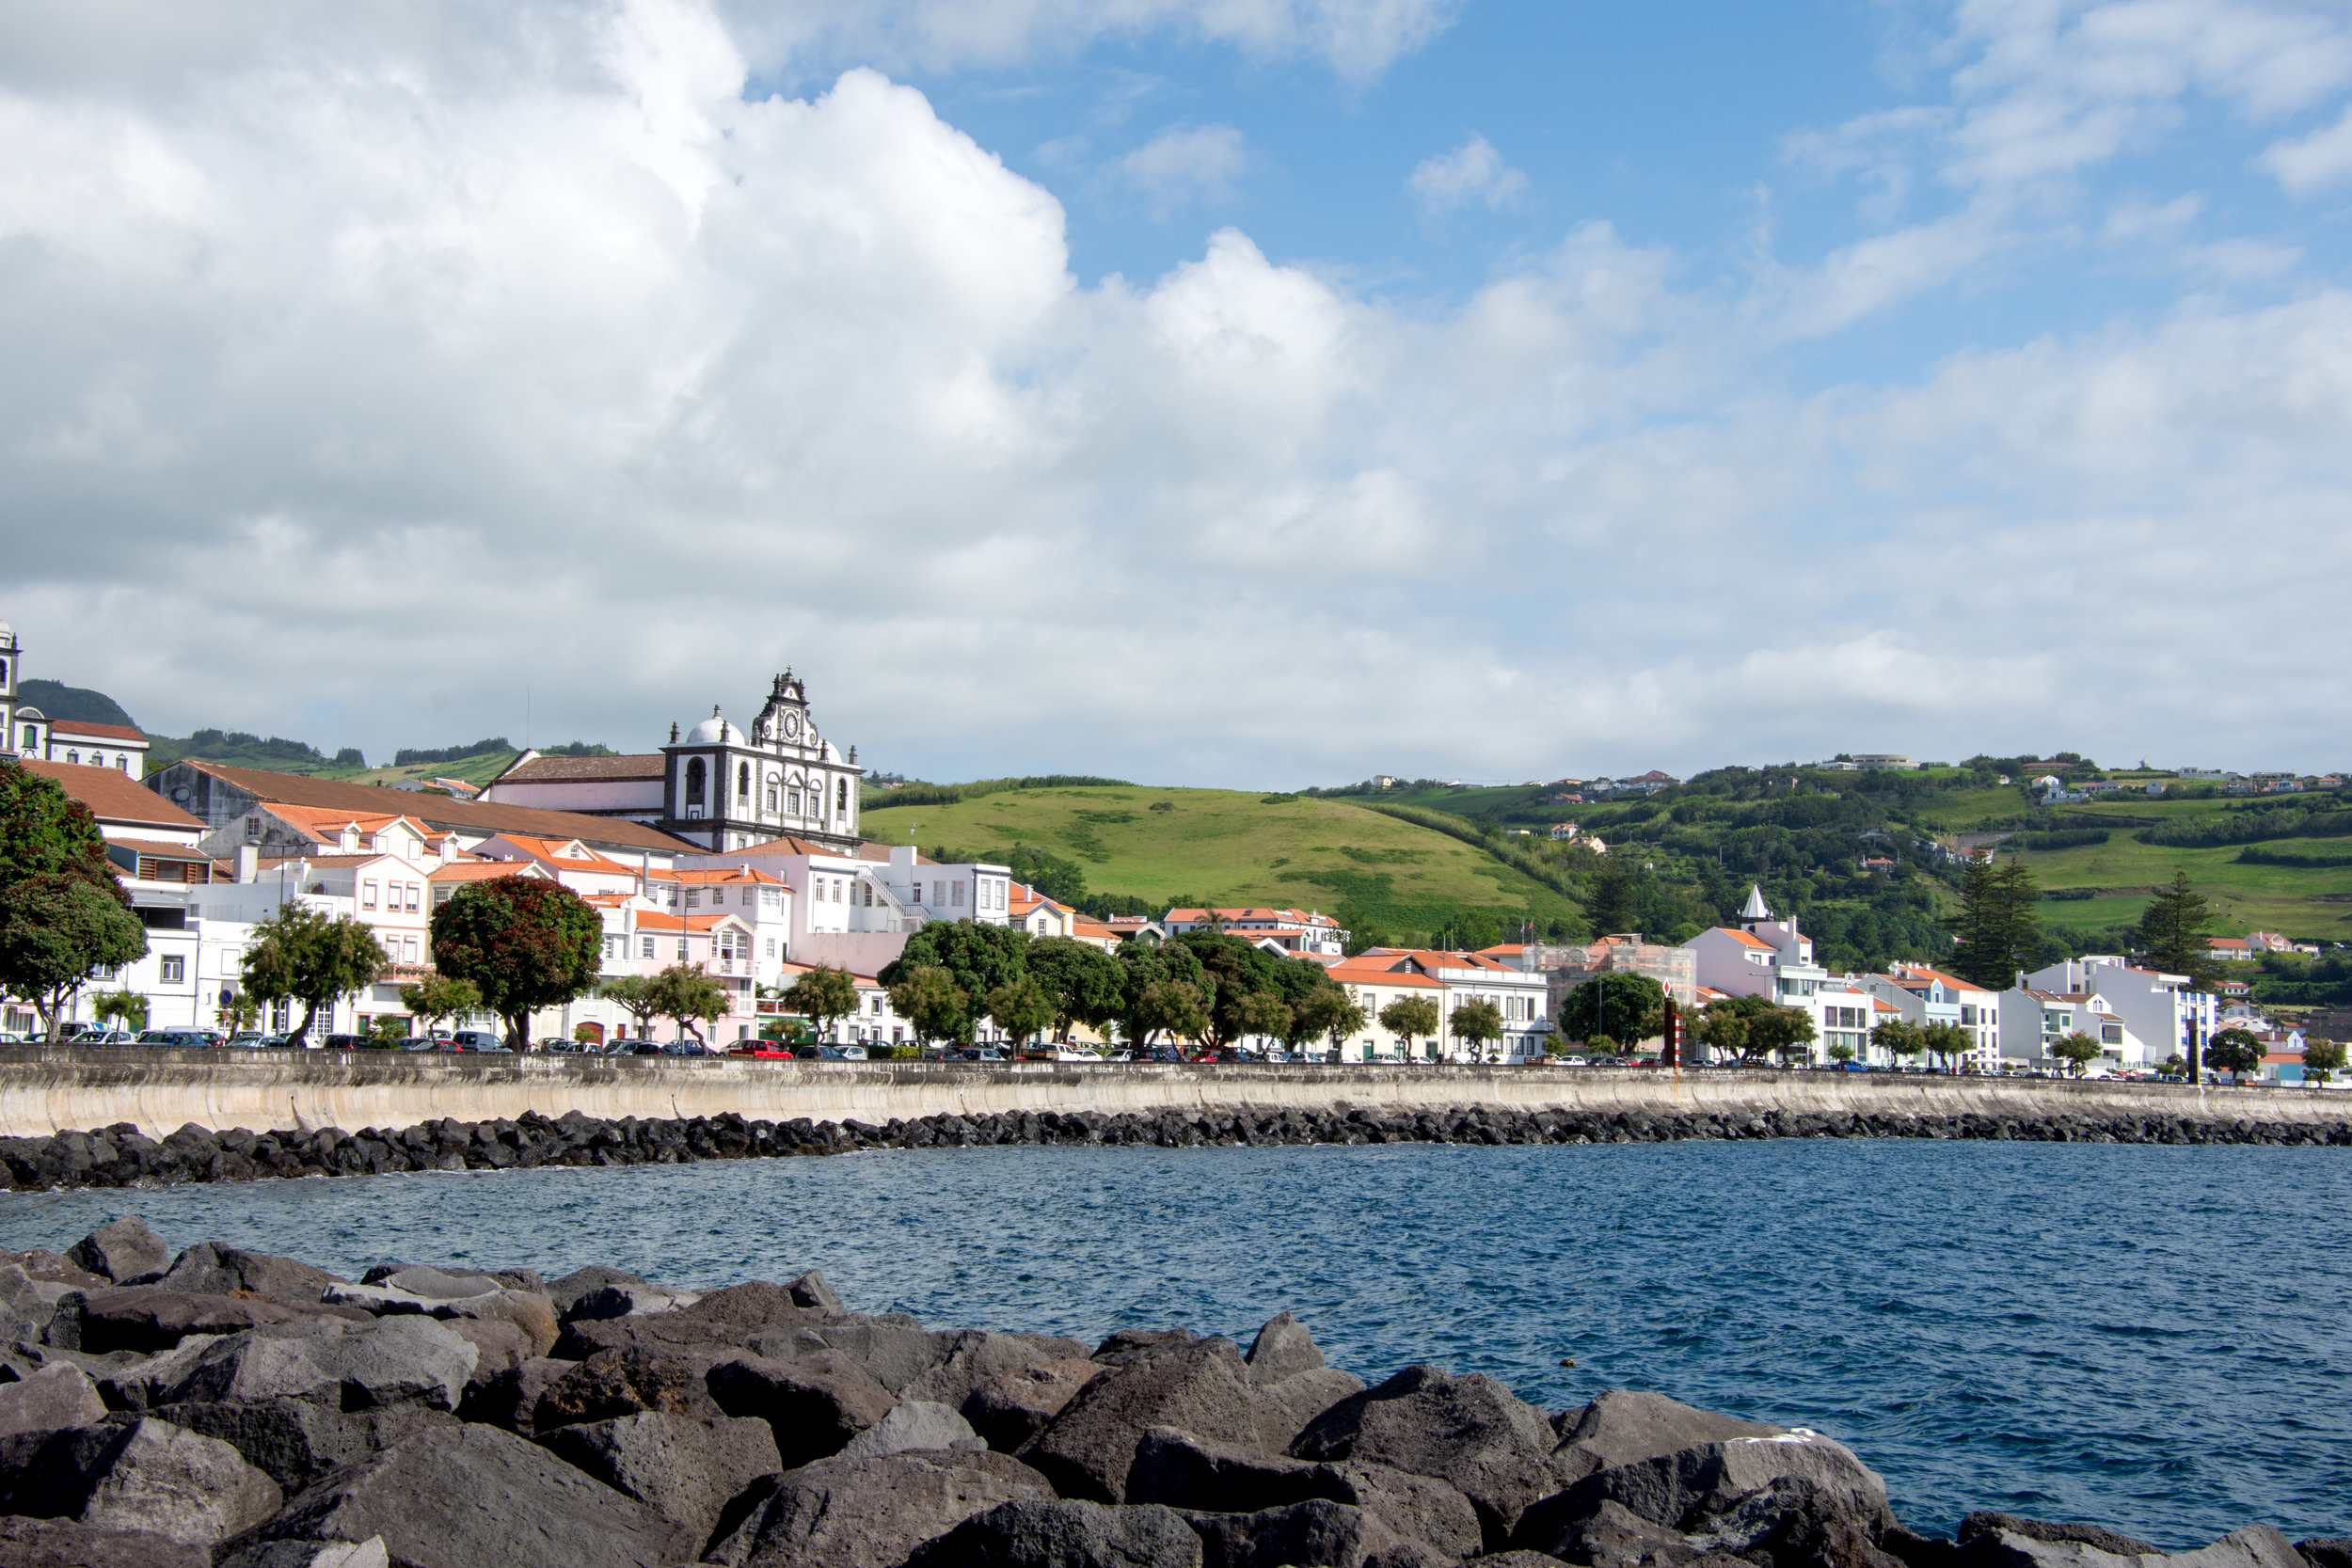 The city of Horta on Faial Island